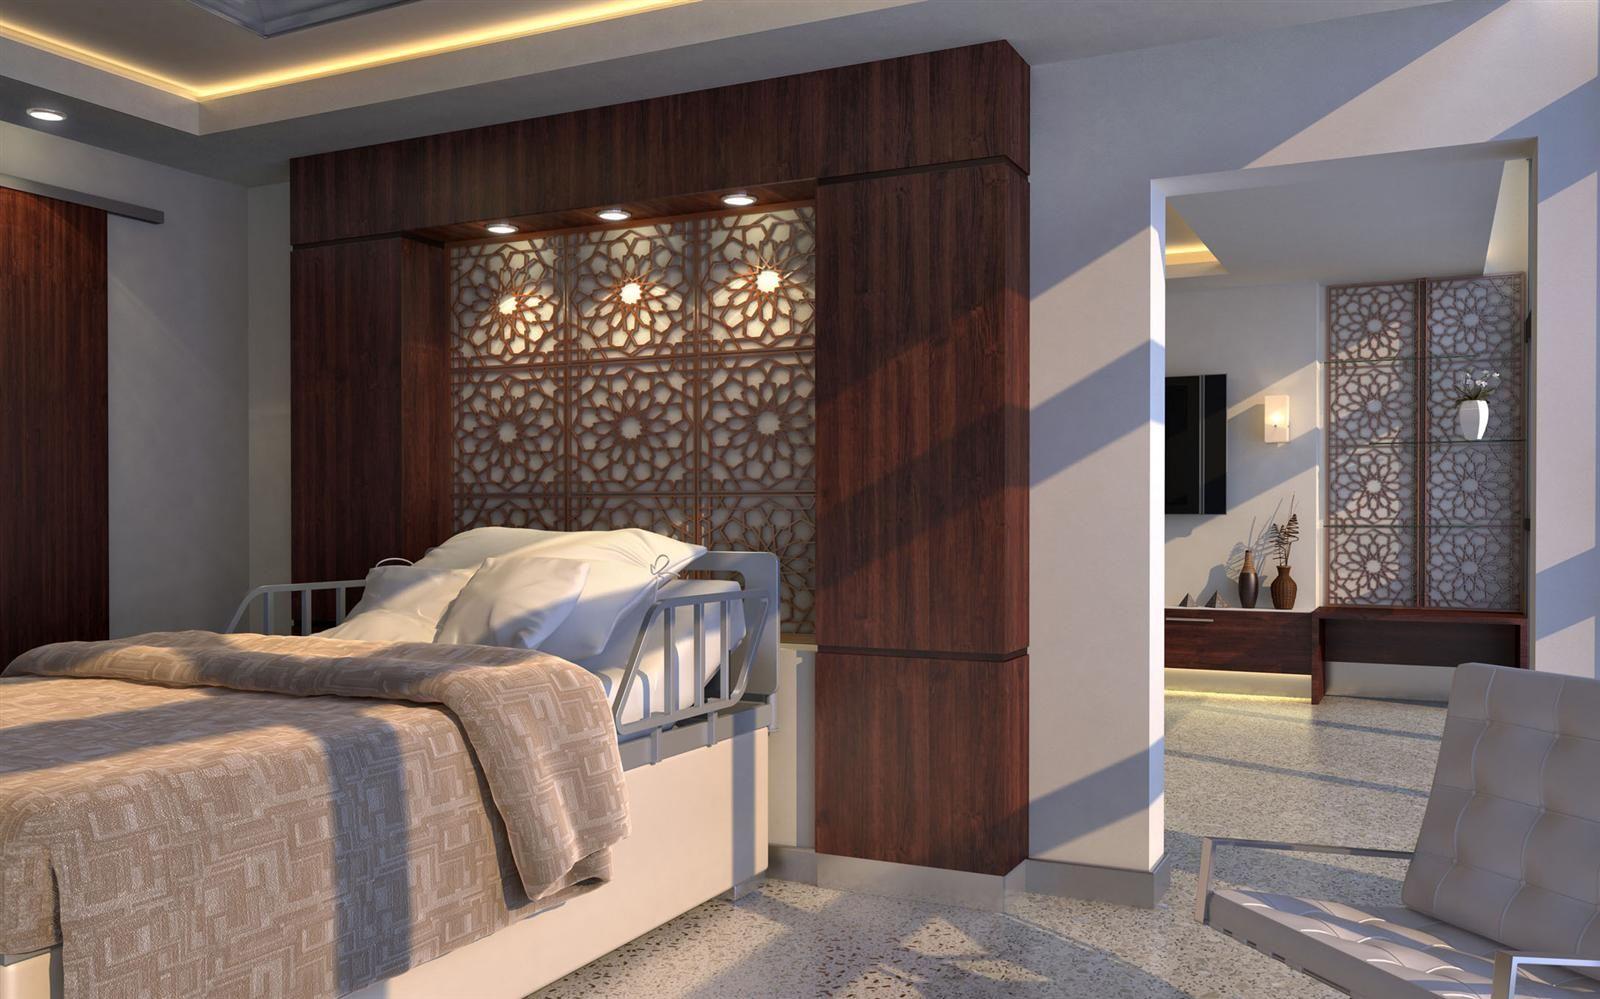 Cleveland Clinic Abu Dhabi Hospital